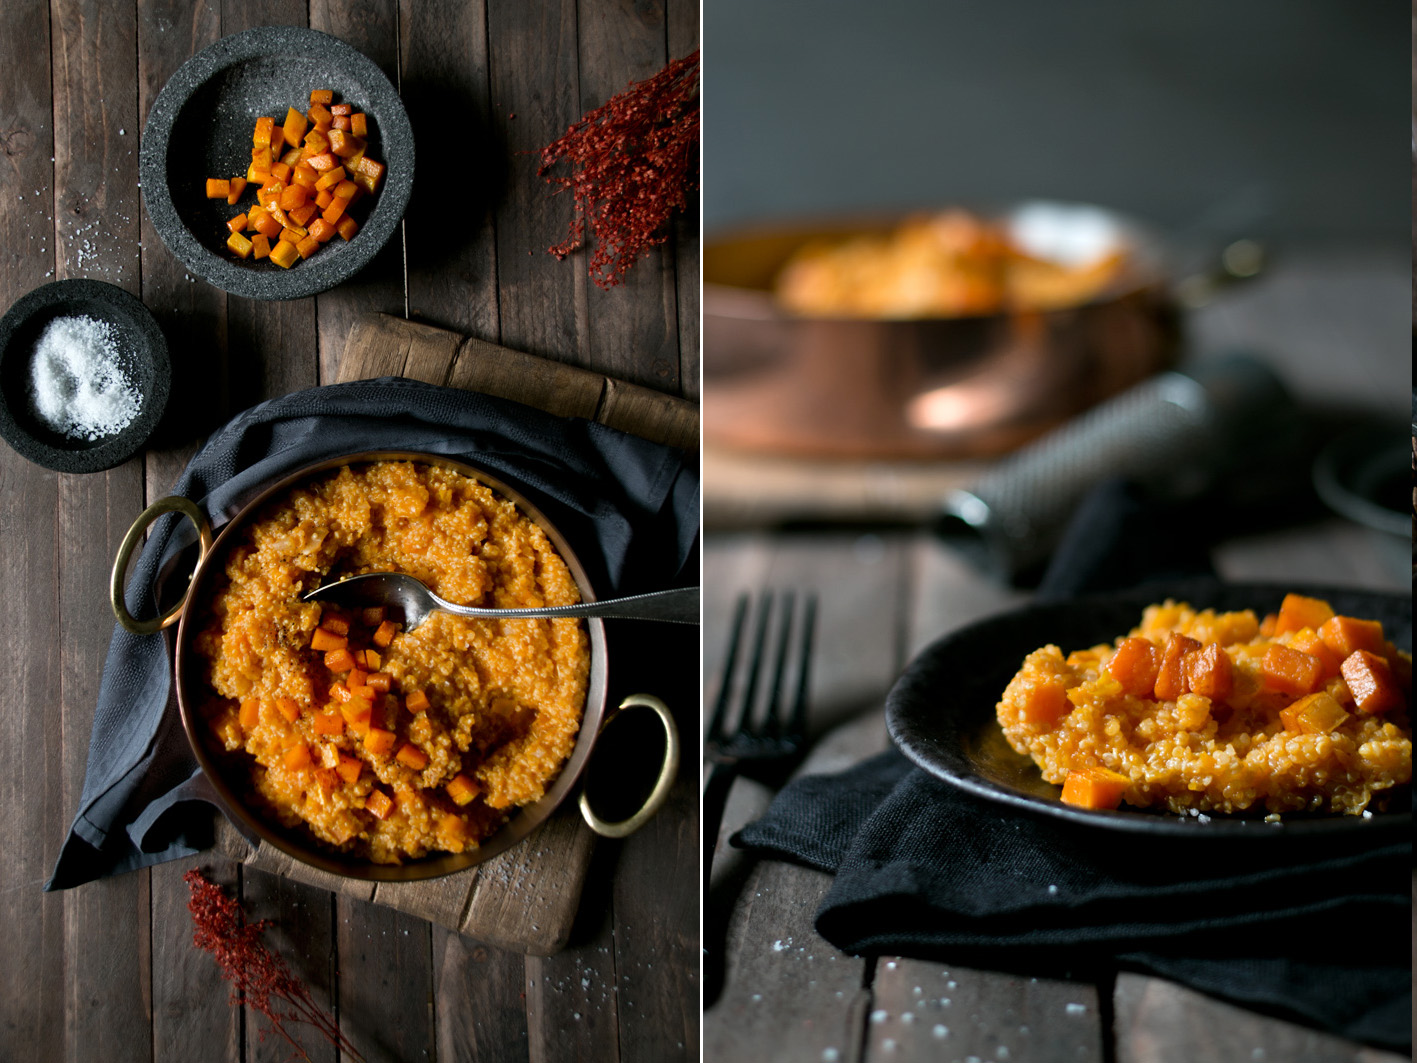 kuerbis risotto quinoa